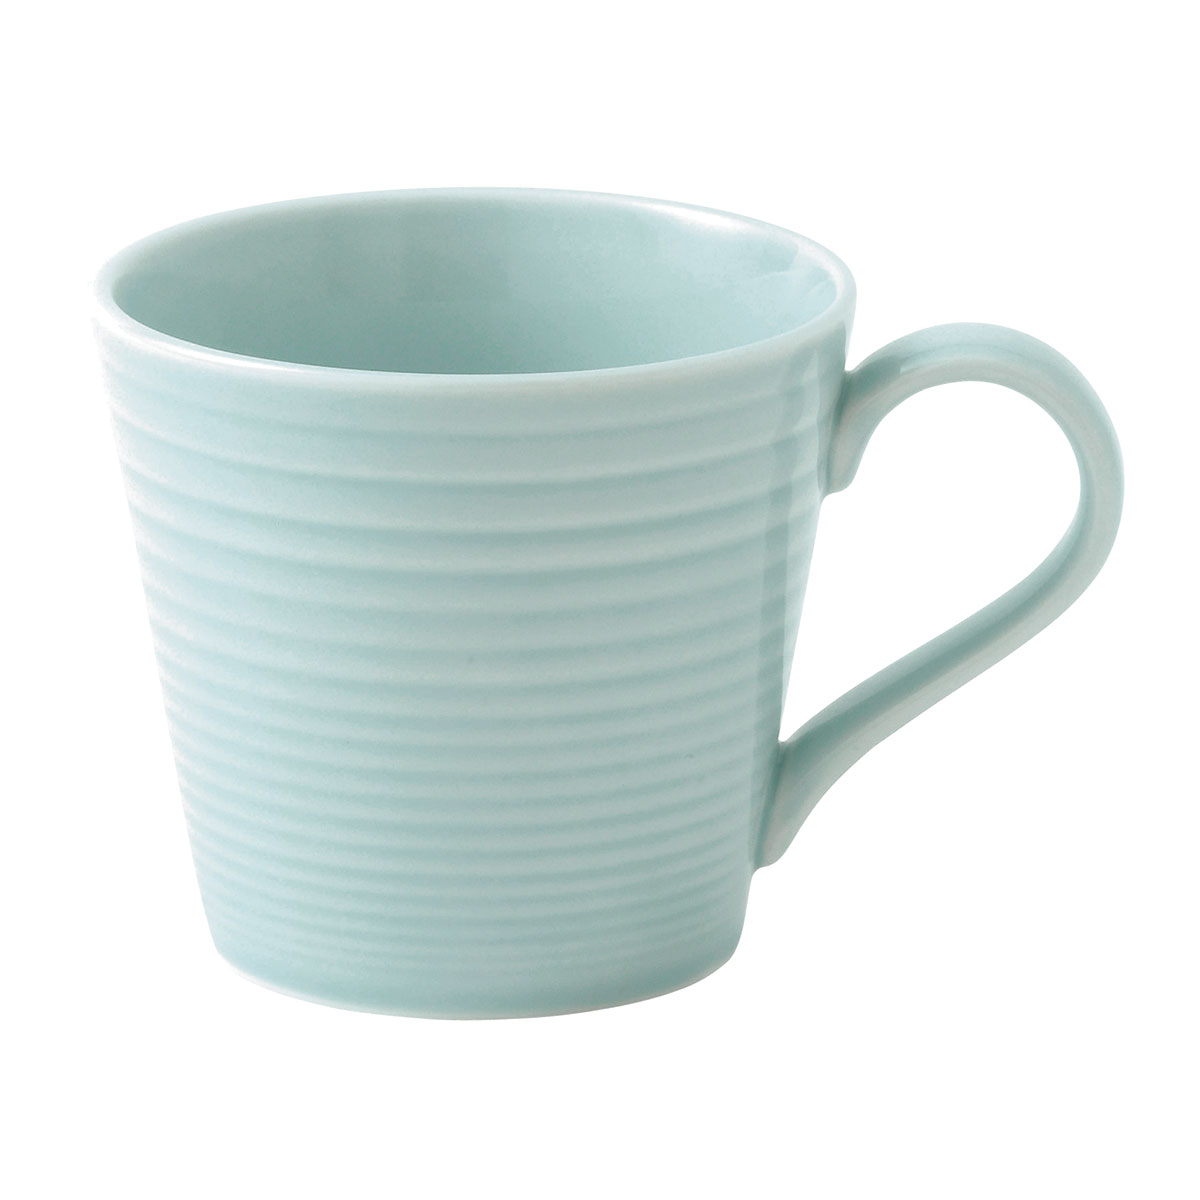 Royal Doulton Gordon Ramsay Maze Blue Mug 14 Oz